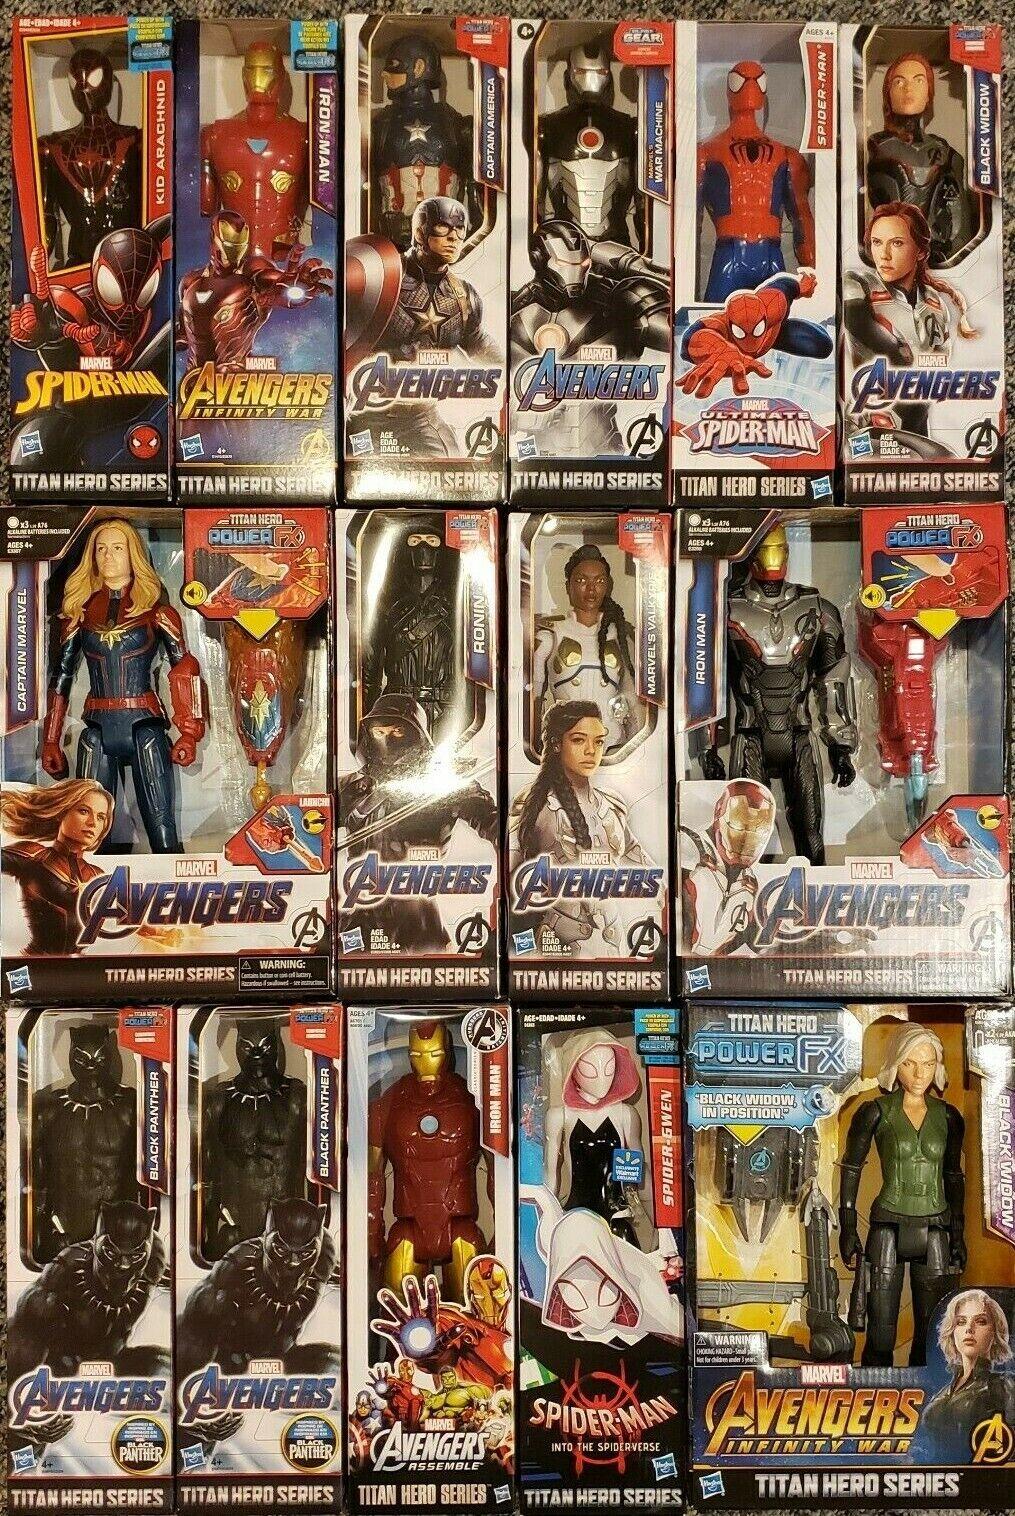 avengers titan hero series 12 inch action